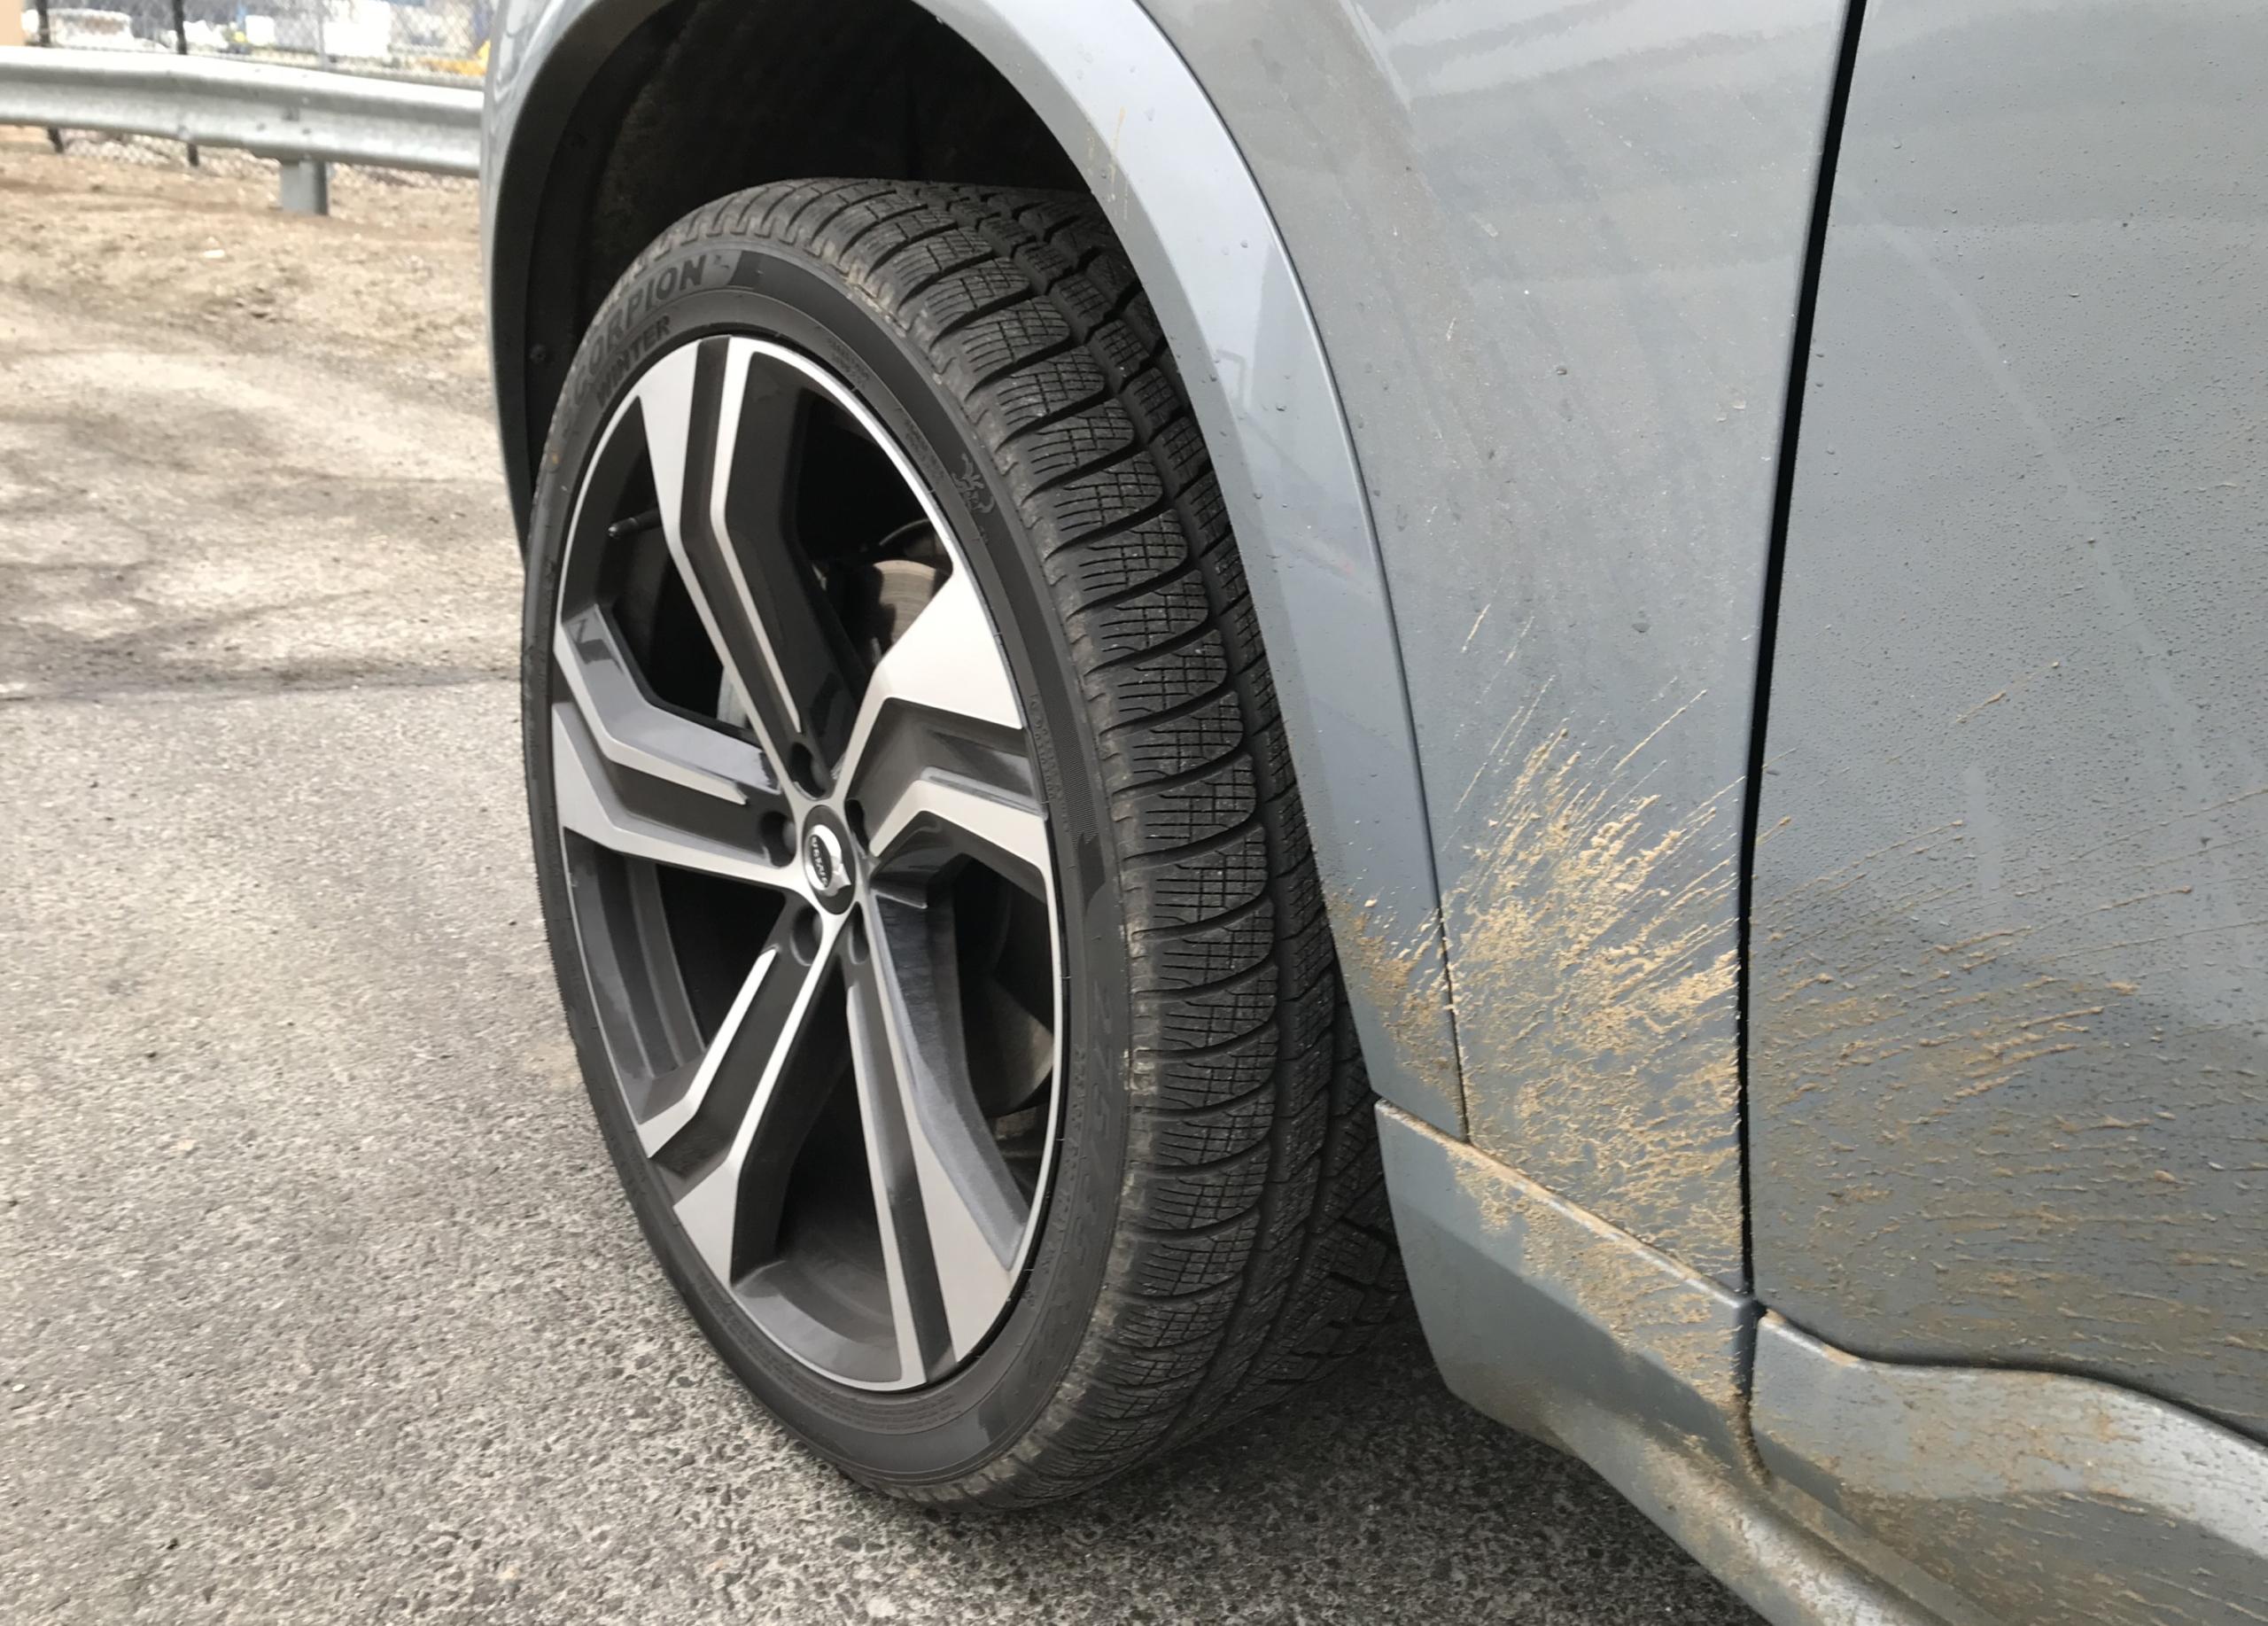 volvo xc90 22 inch wheels snow winter tires pirelli 285